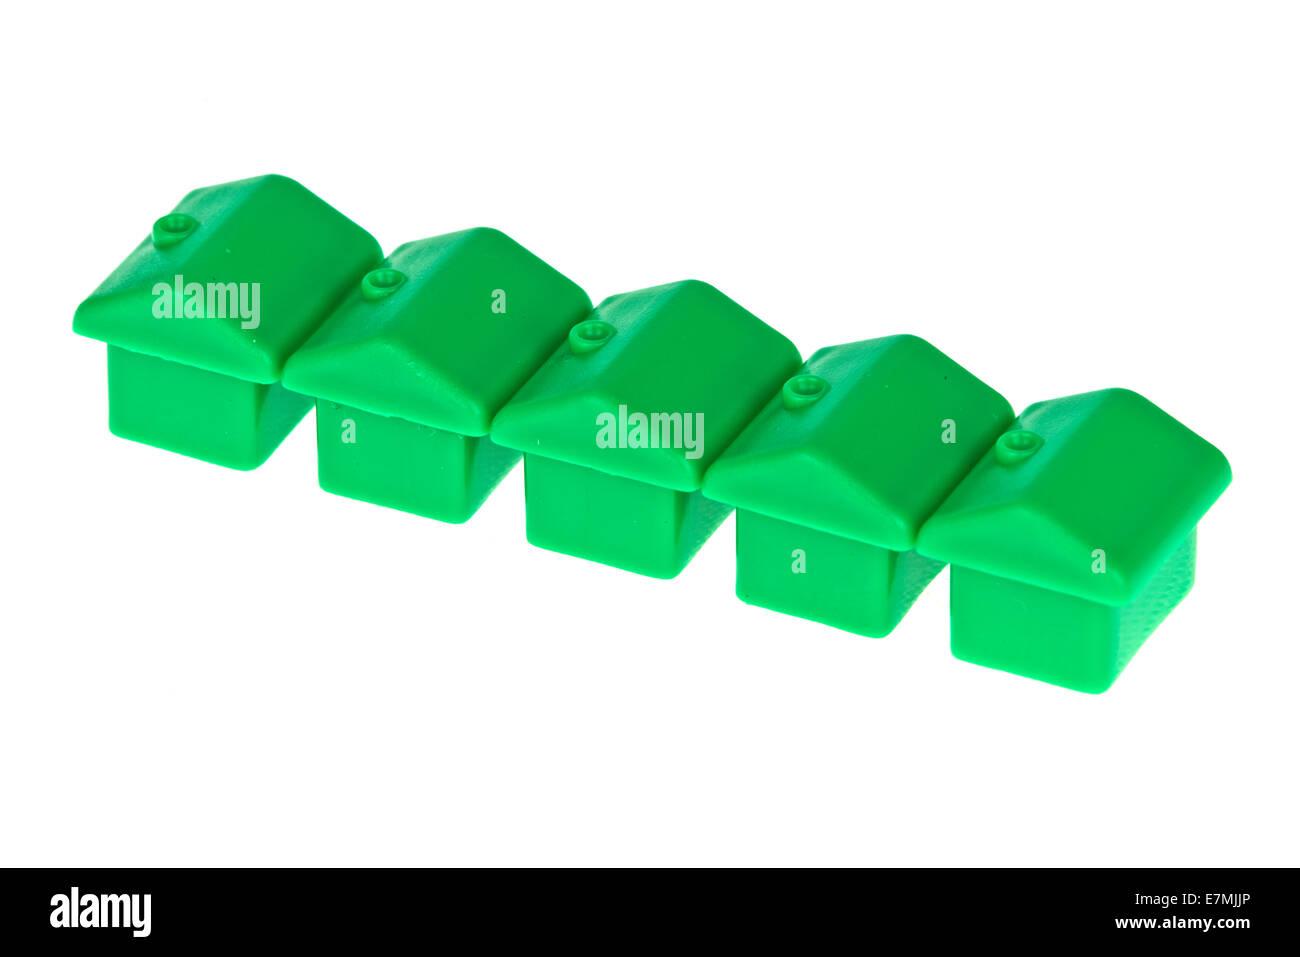 Diagonal Toy Monopoly Houses - Stock Image